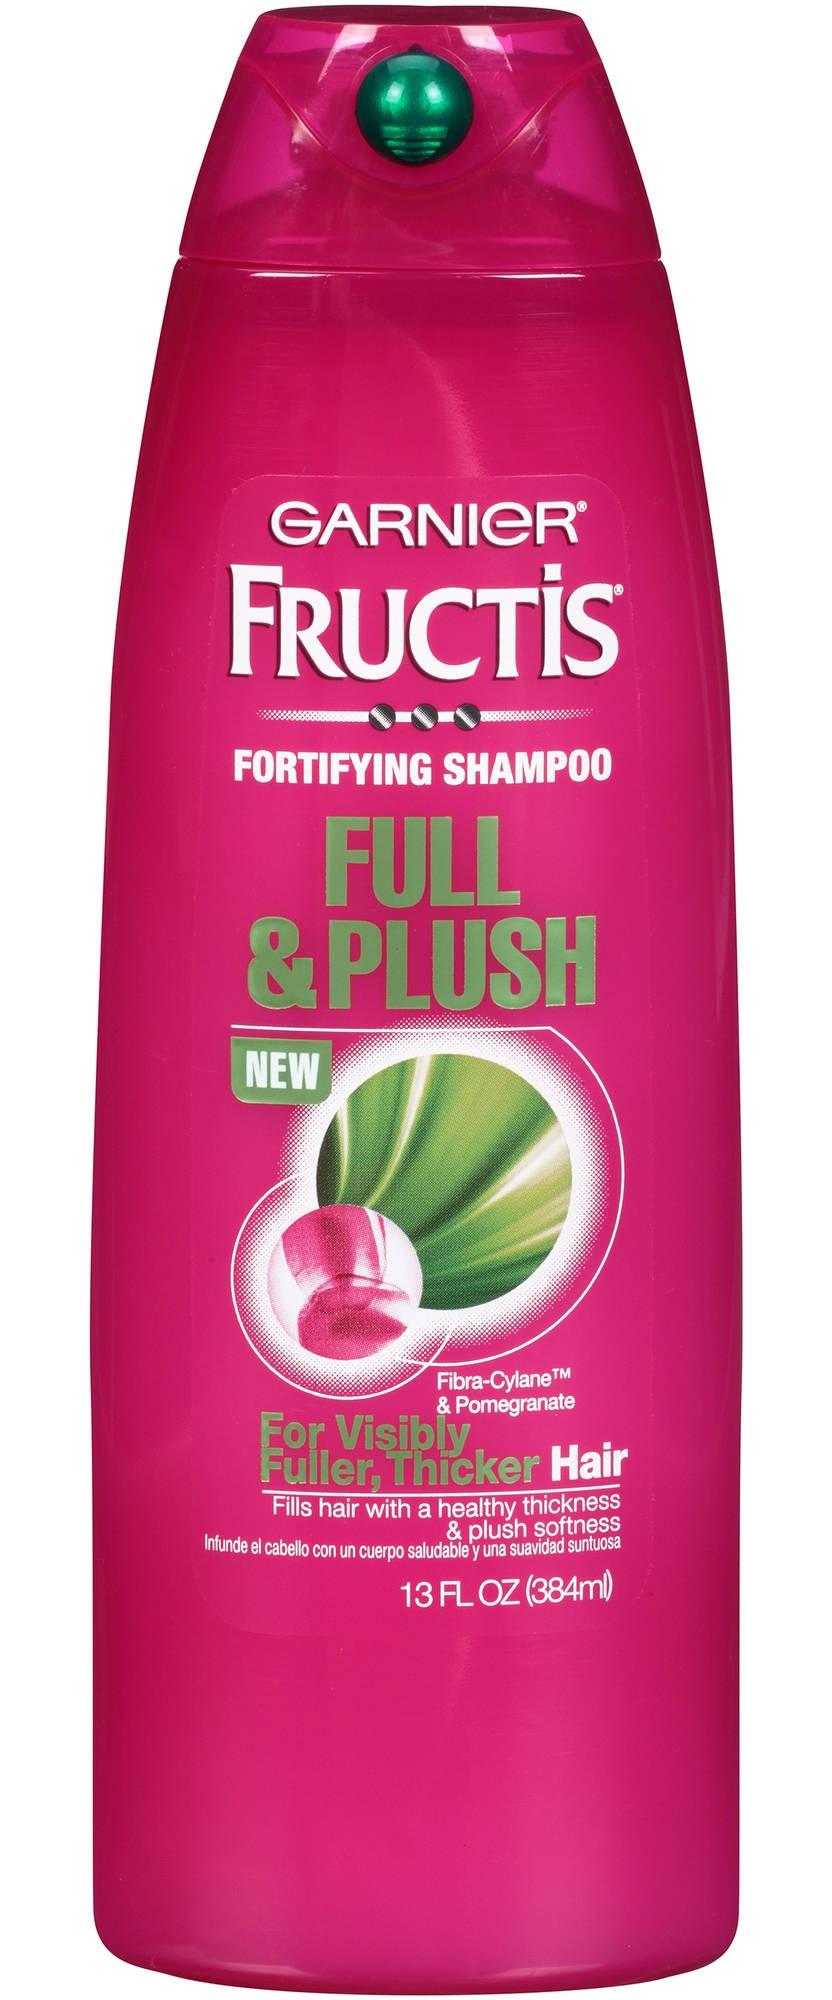 Garnier Hair Care Fructis Full & Plush Shampoo